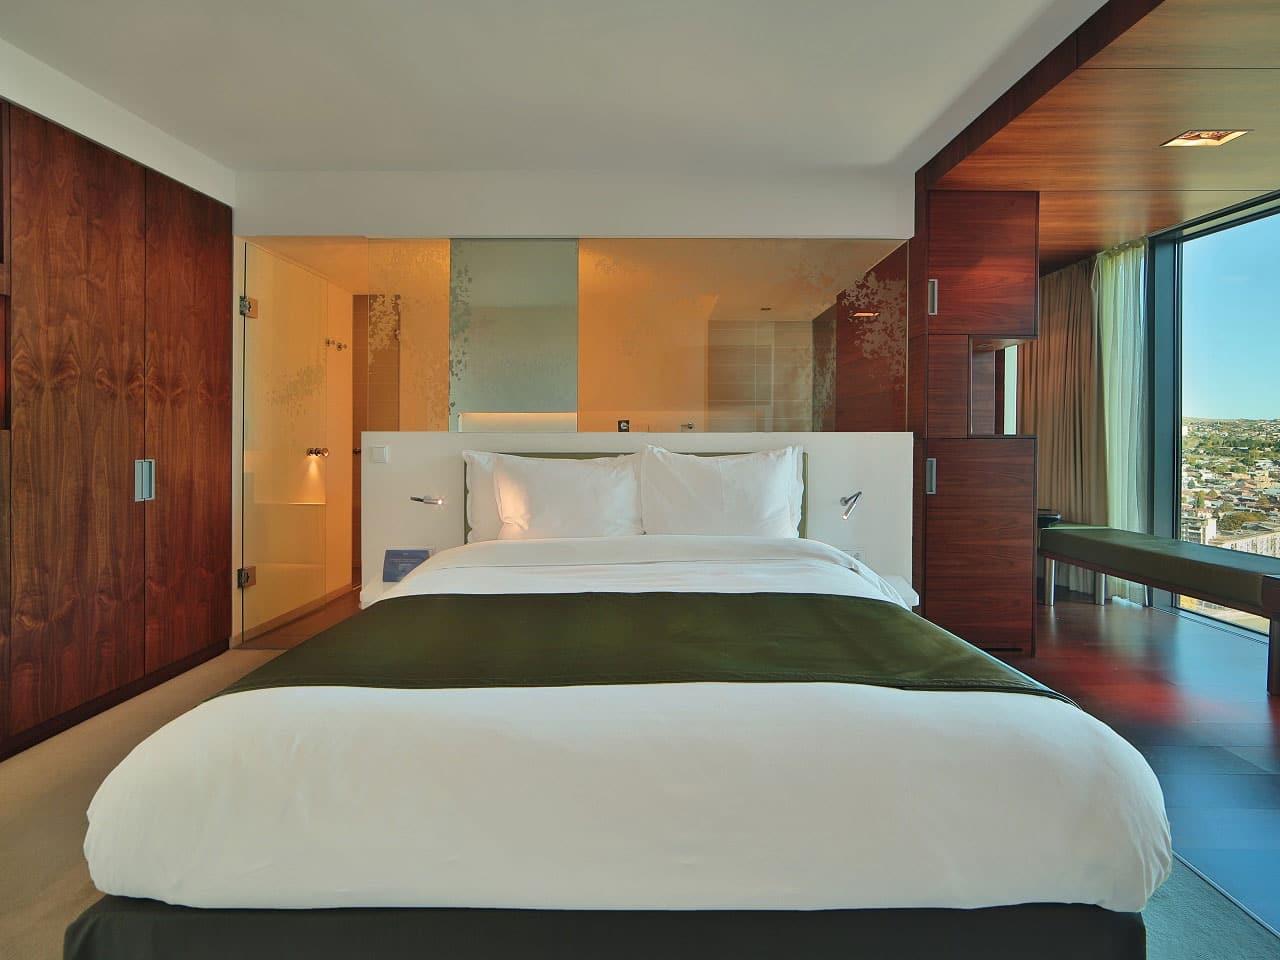 Radisson Blu Iveria Standard Room